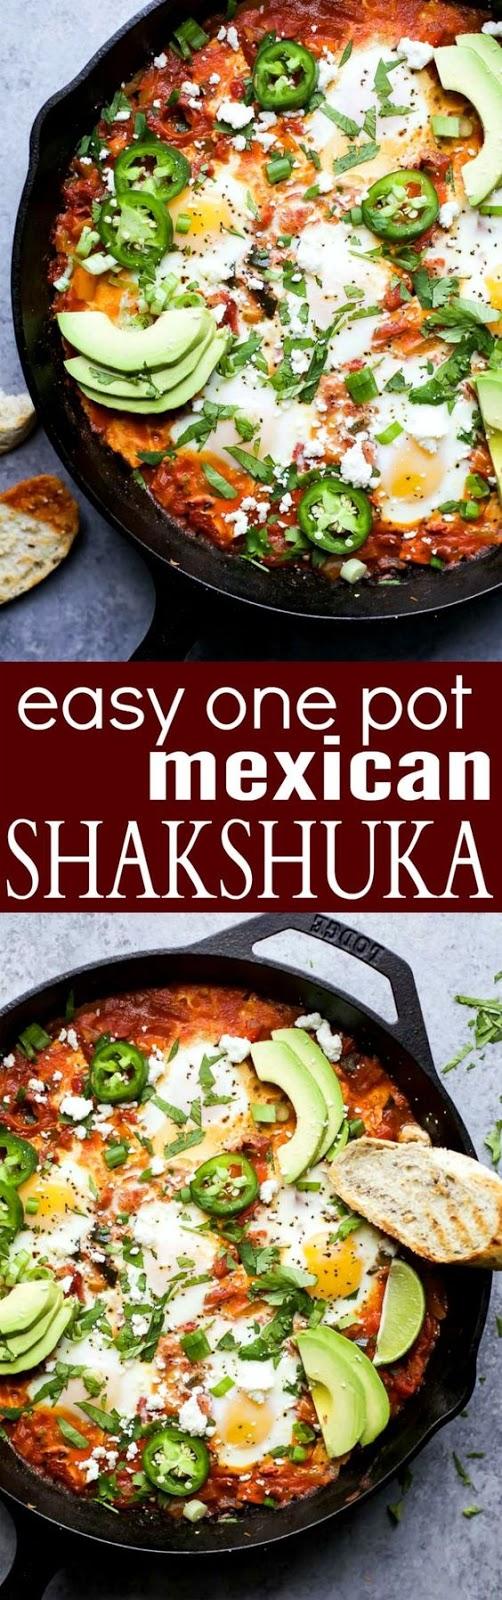 Easy One Pot Mexican Shakshuka